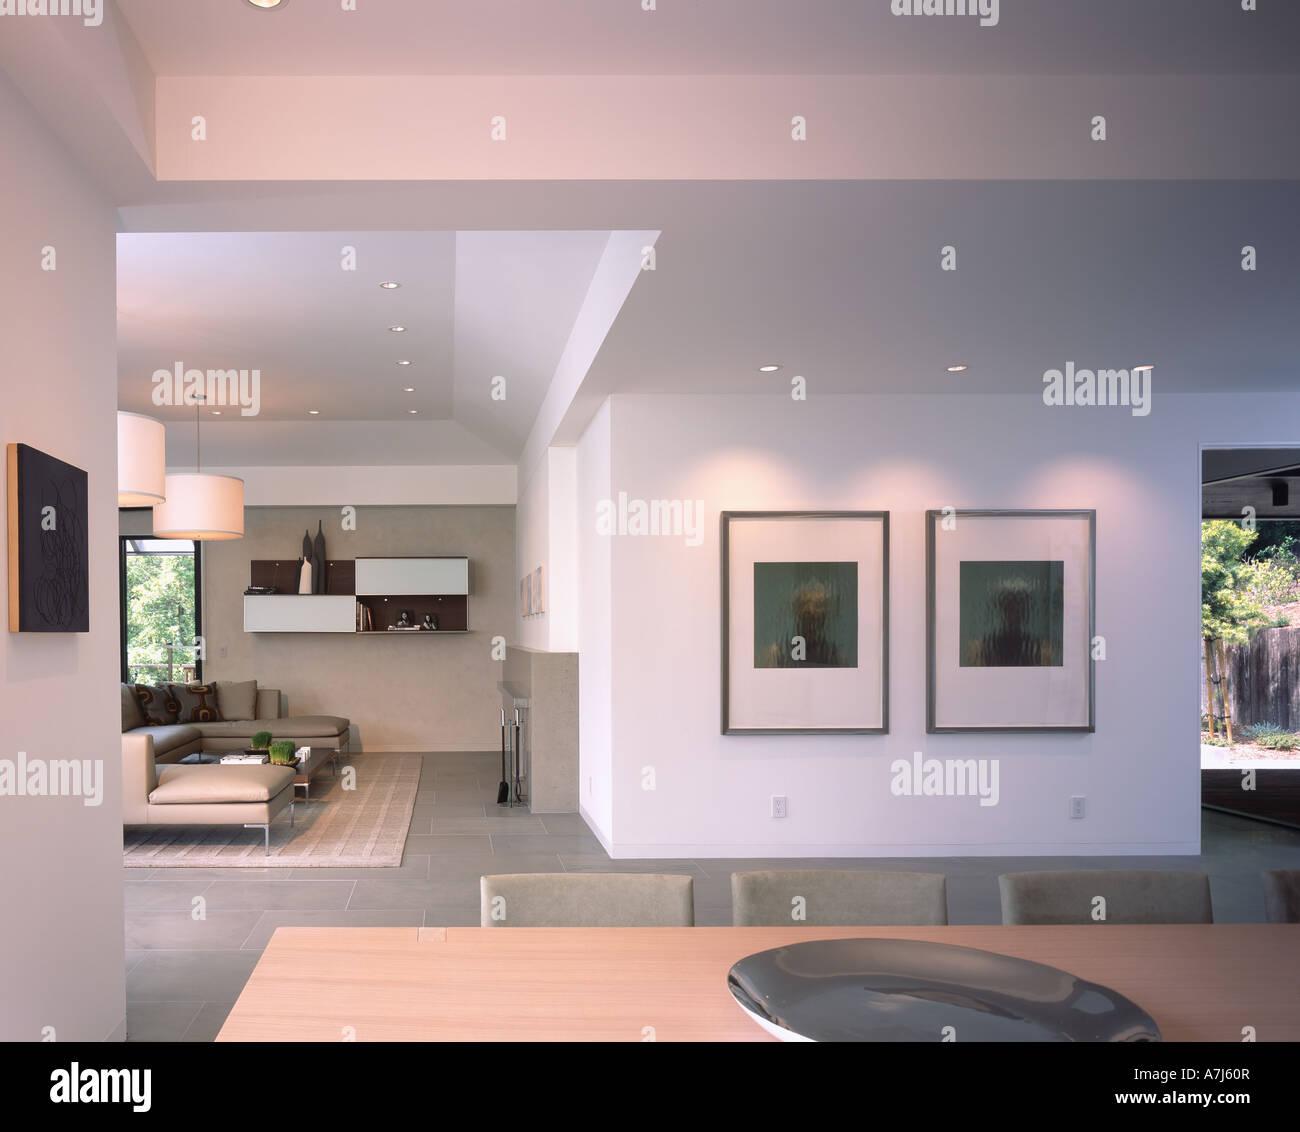 Pebble Beach Residence Architect: Jorie Clark Design - Stock Image